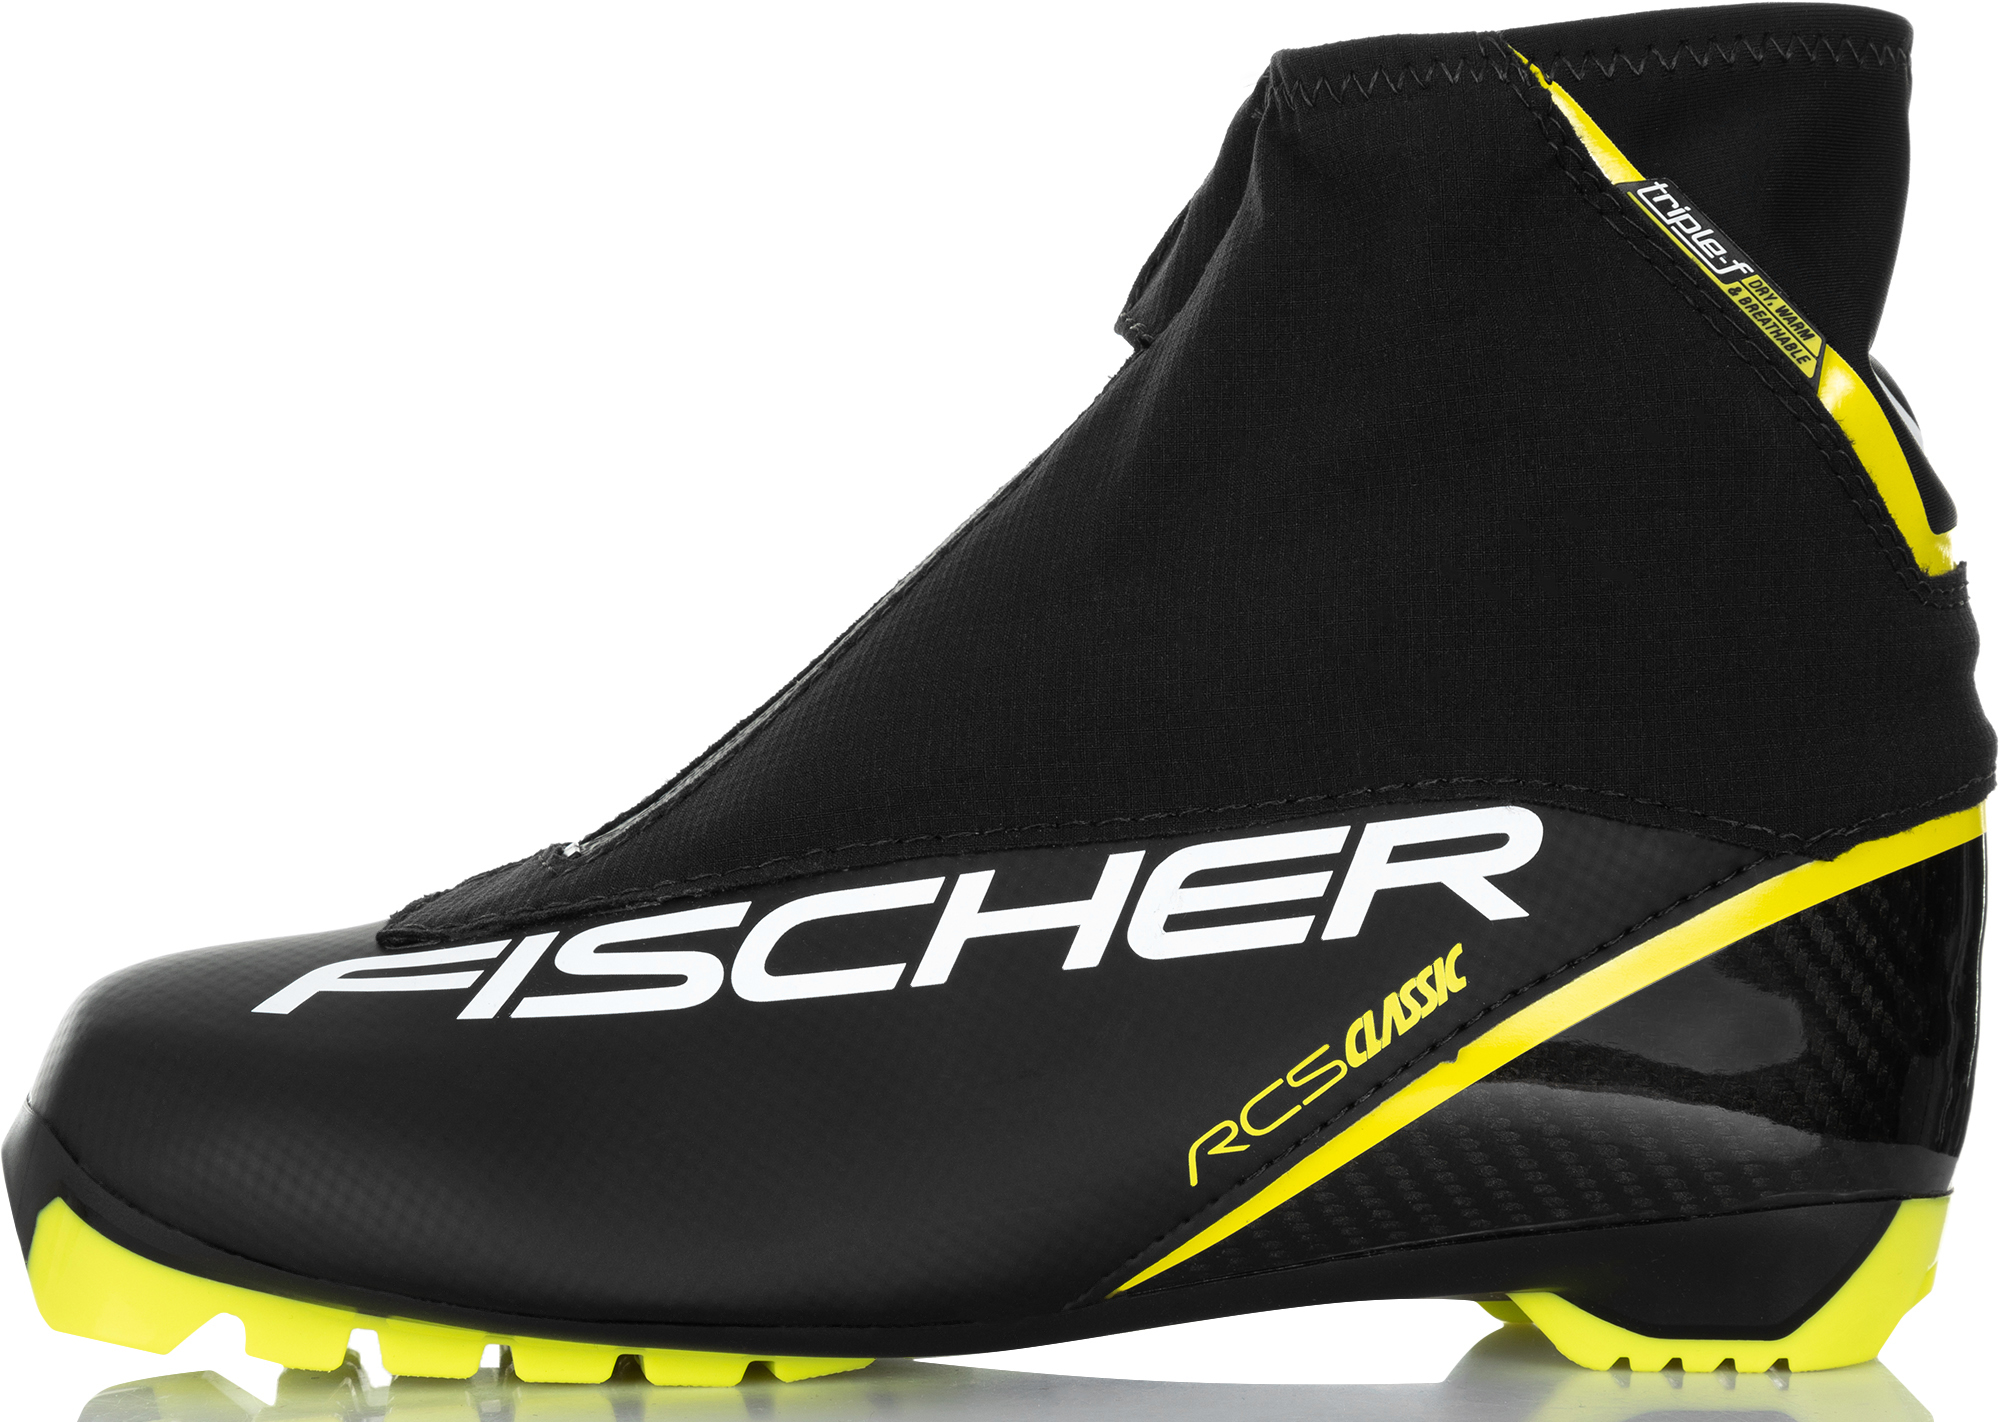 Fischer Ботинки для беговых лыж Fischer RCS Classic, размер 41 цена